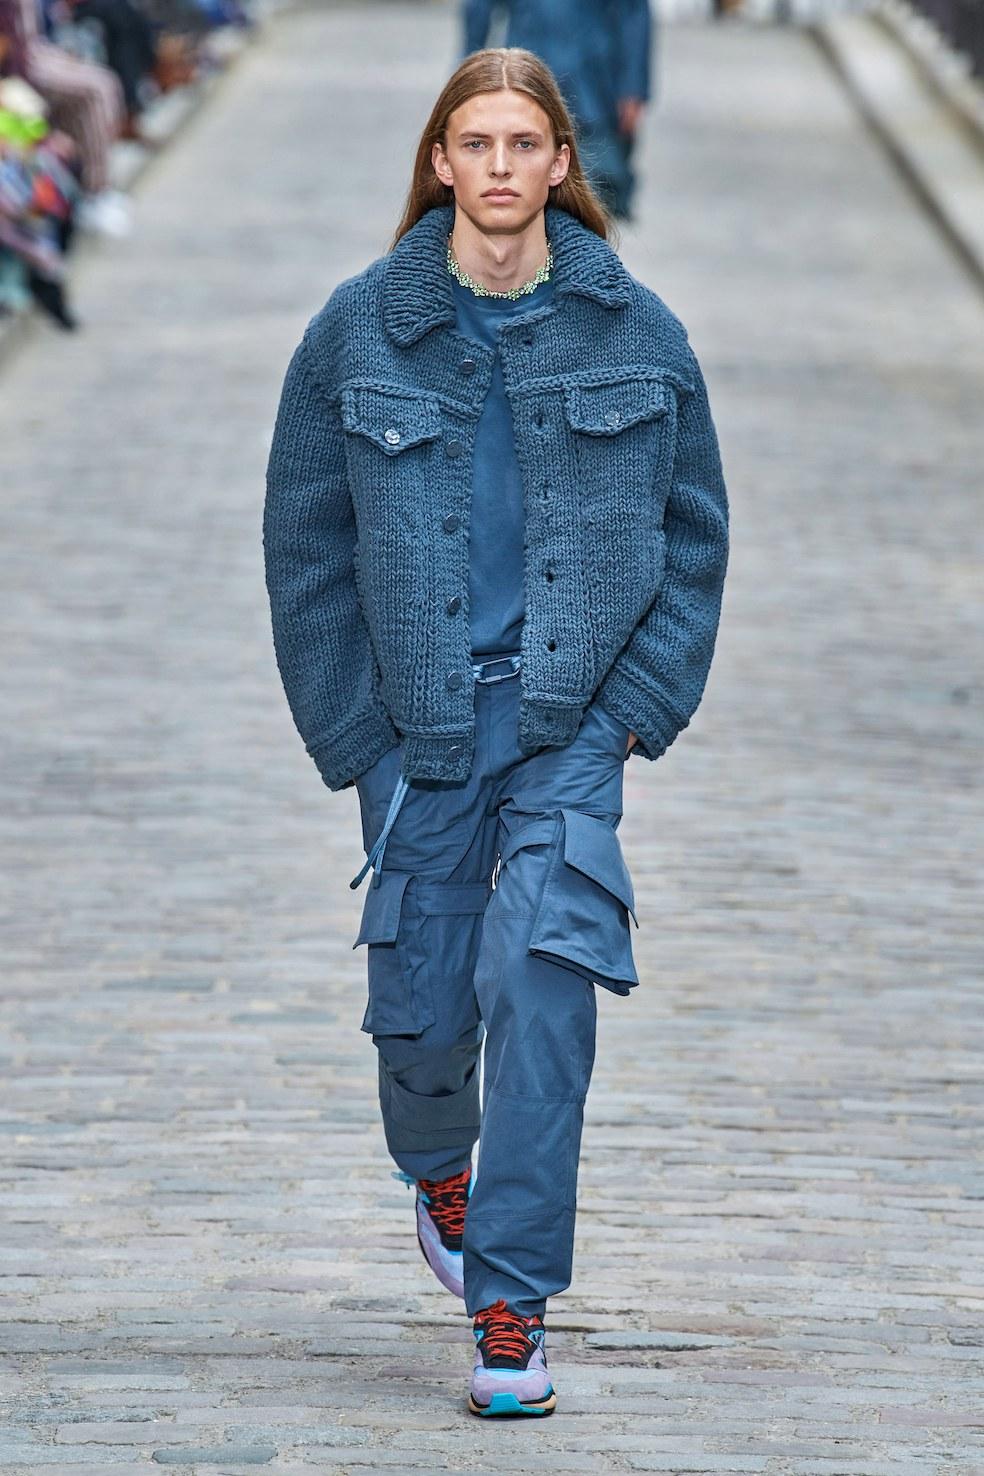 Louis_Vuitton_SS20_Behind_The_Blinds_Magazine__FIO0565.jpg